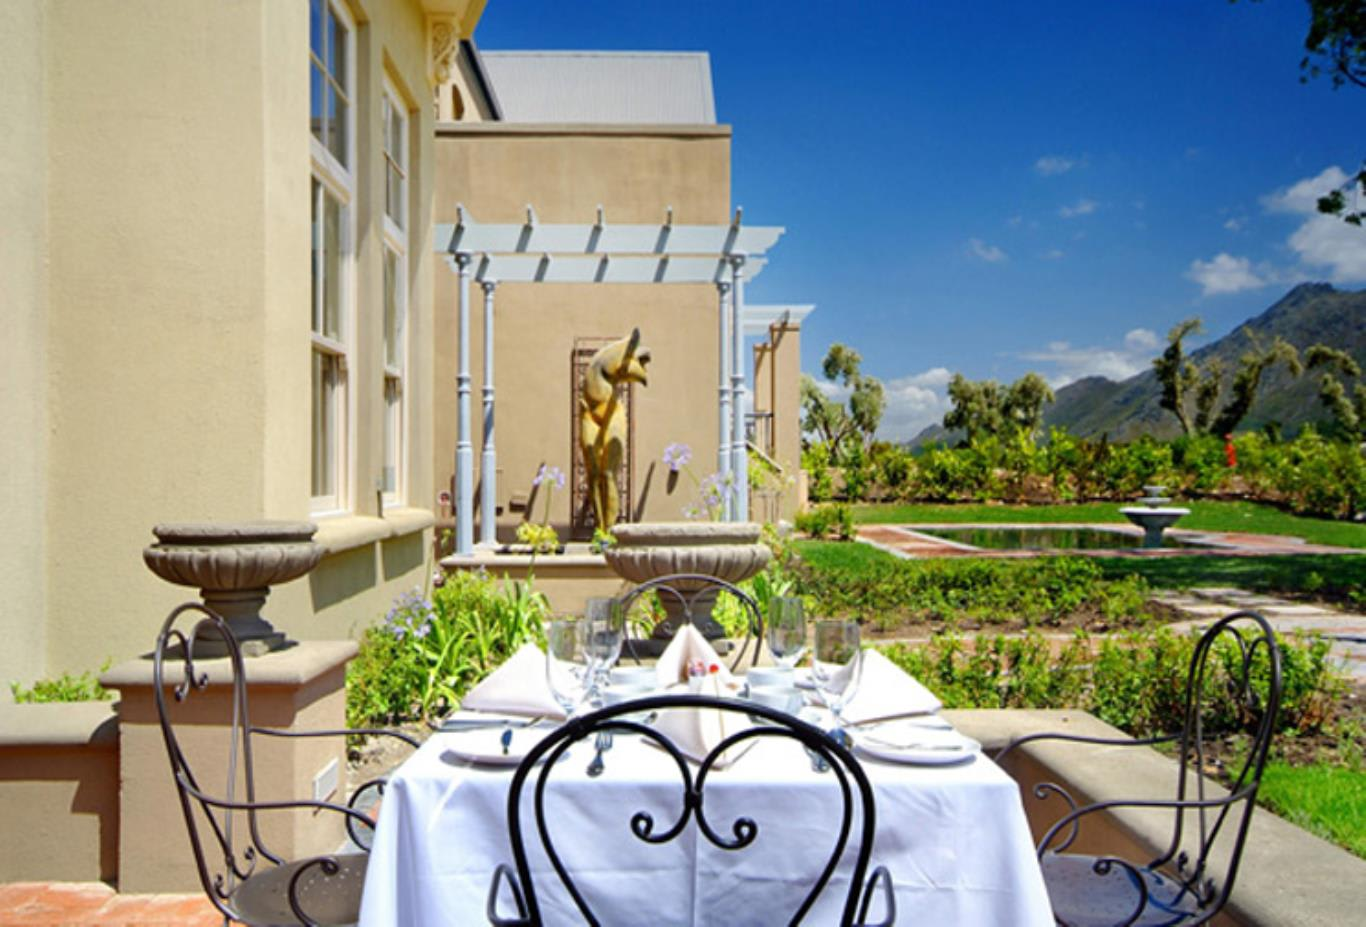 Hotel-Dining-Area